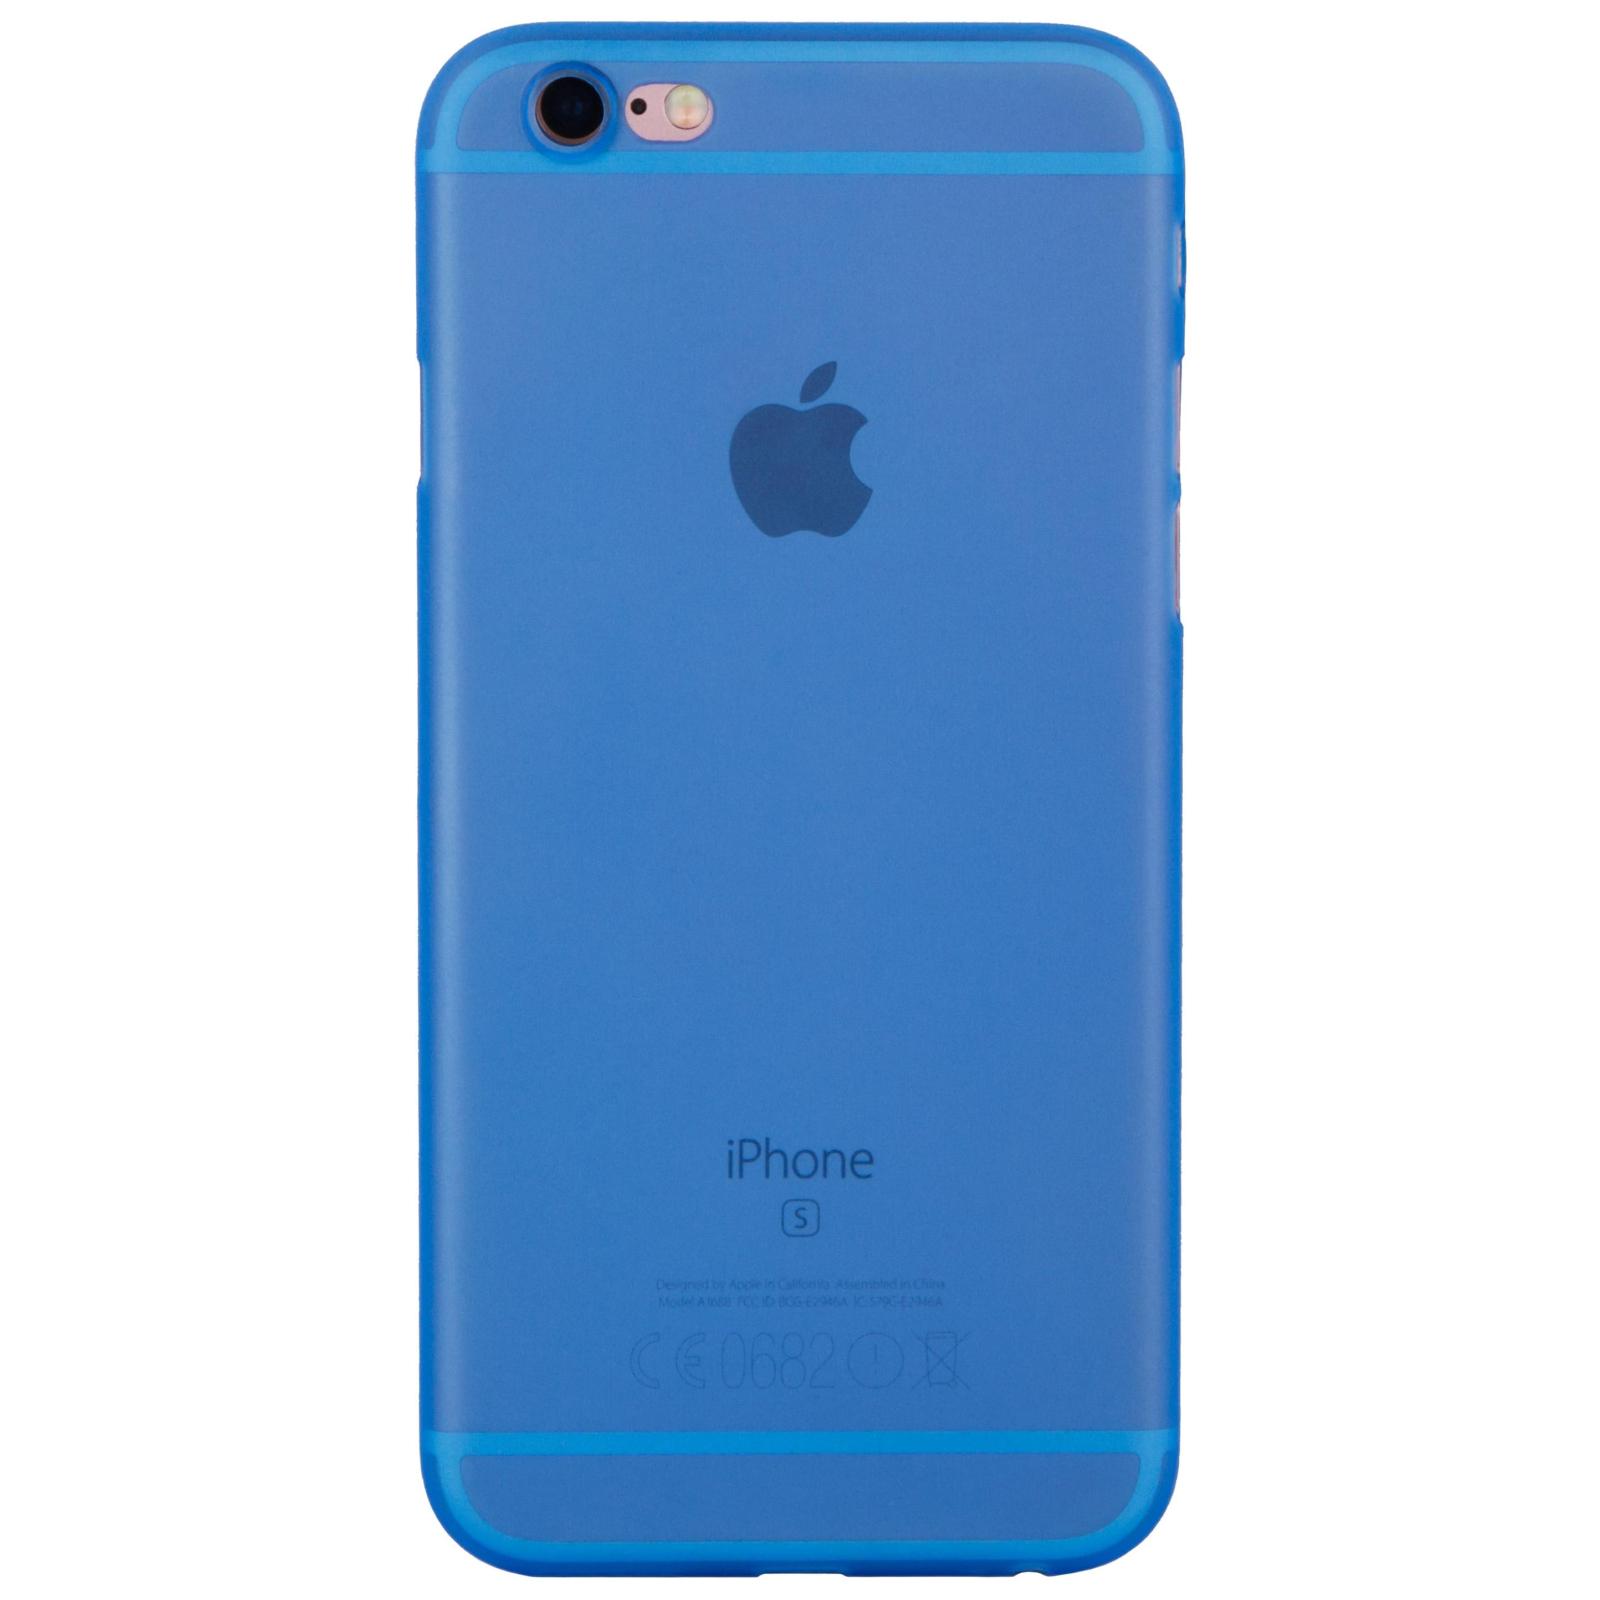 Чехол для моб. телефона MakeFuture Ice Case (PP) для Apple iPhone 6 Blue (MCI-AI6BL)